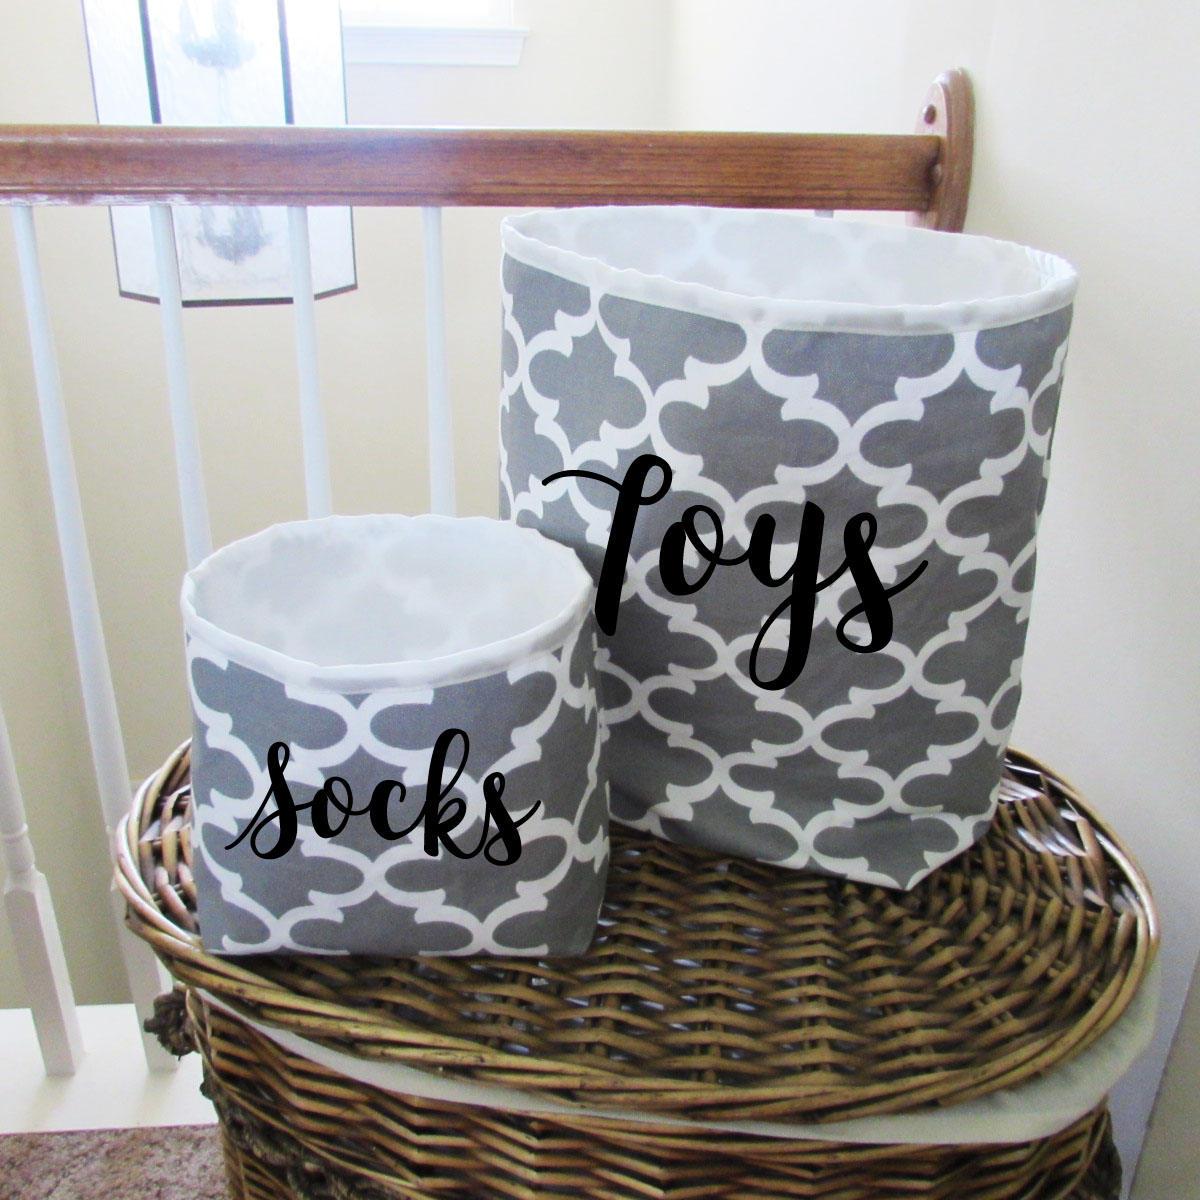 bac de rangement tissu stockage organisateur panier de etsy. Black Bedroom Furniture Sets. Home Design Ideas